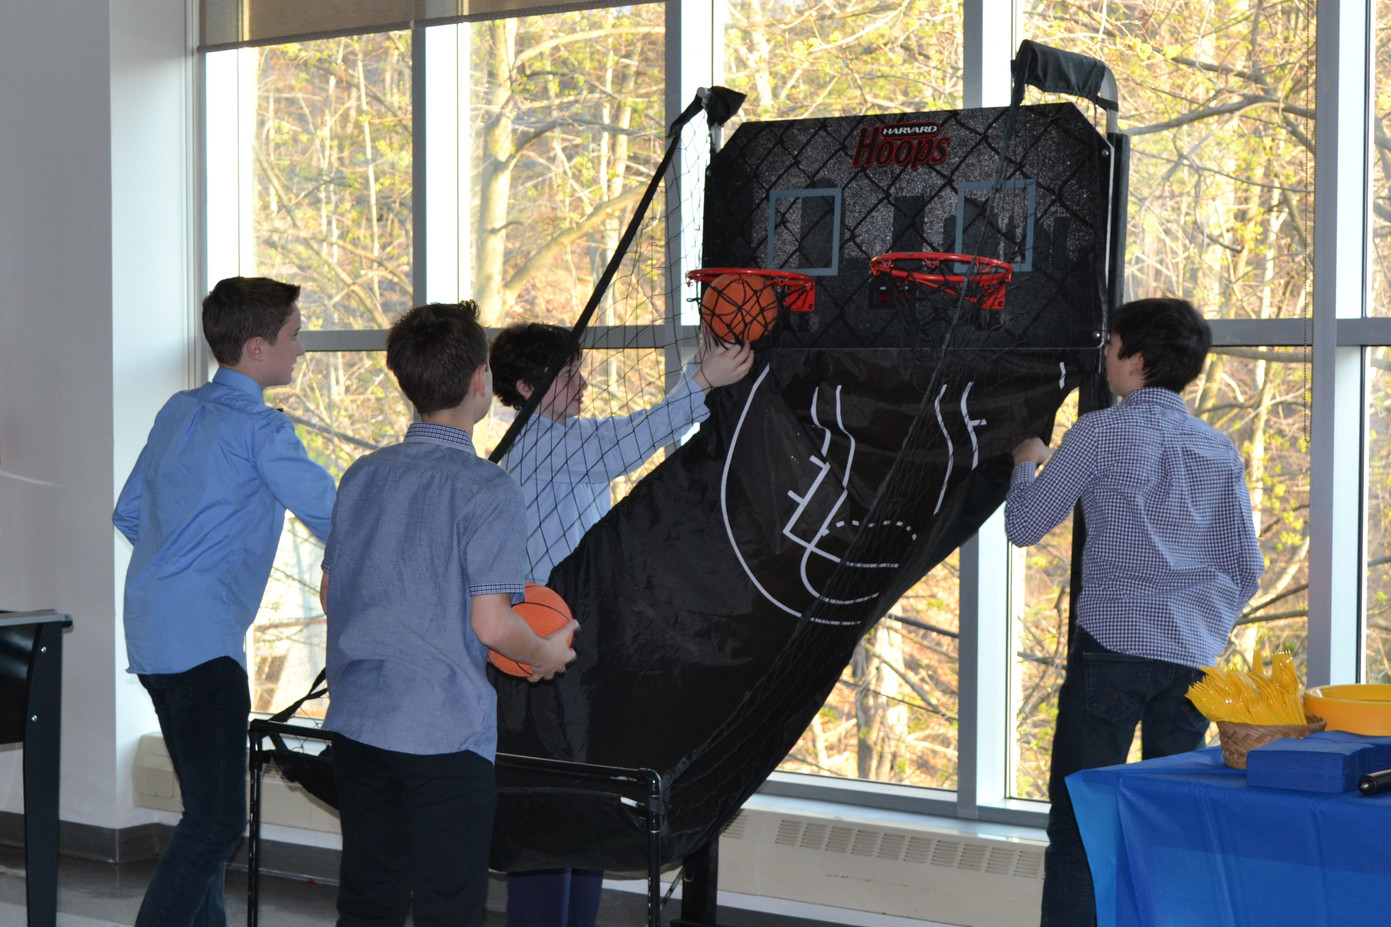 Double-Shot-Basketball-Playing-Game-For-Boys.jpg